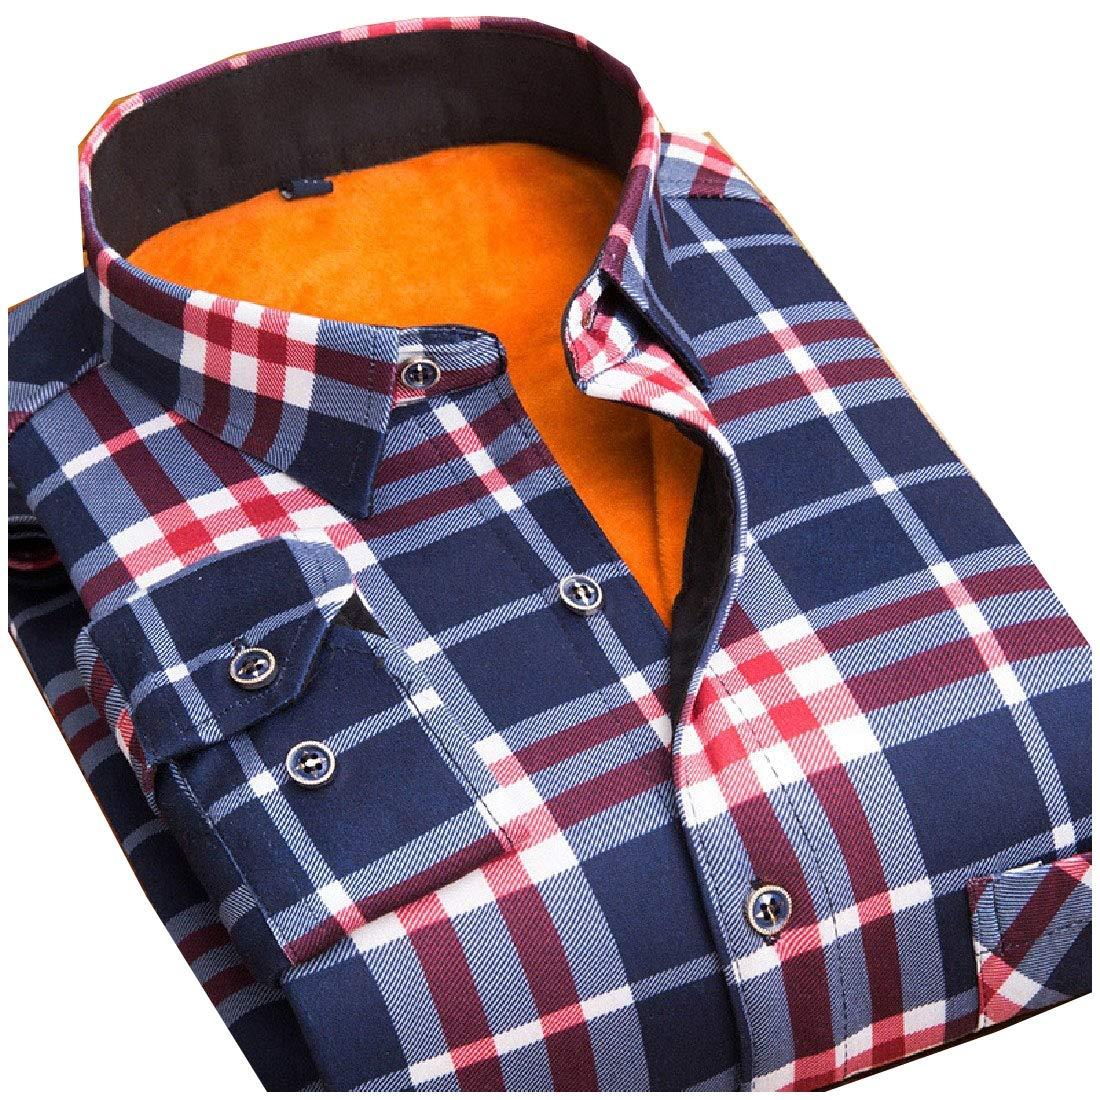 YUNY Men Turn-Down Collar Long-Sleeve Button Print Thicken T-Shirts Shirts AS5 XL